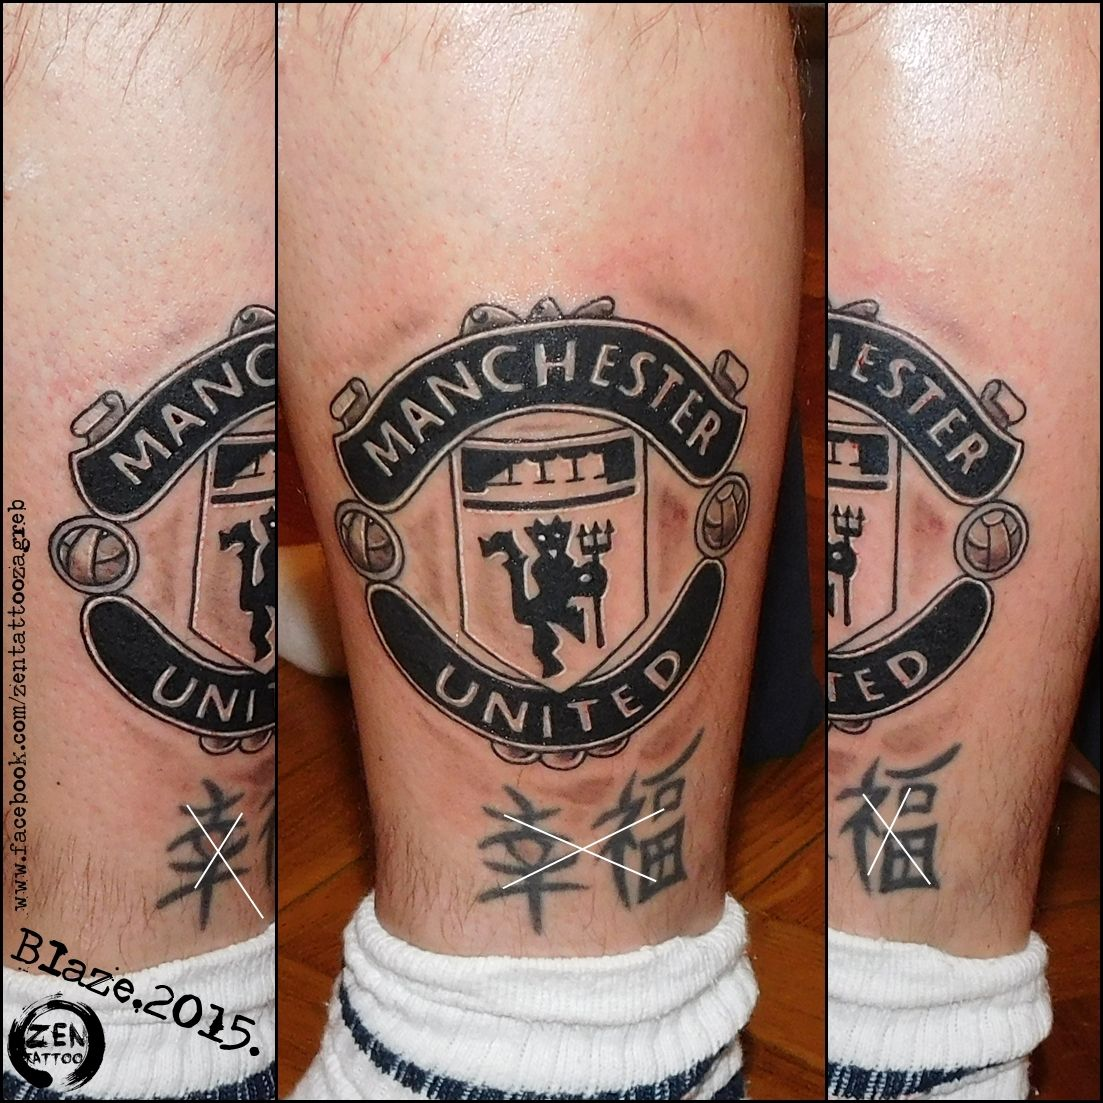 Manchester United Logo Tattoo By Blaze Www Facebook Com Zentattoozagreb Watch Tattoo Design Black And Grey Tattoos Man Utd Tattoo